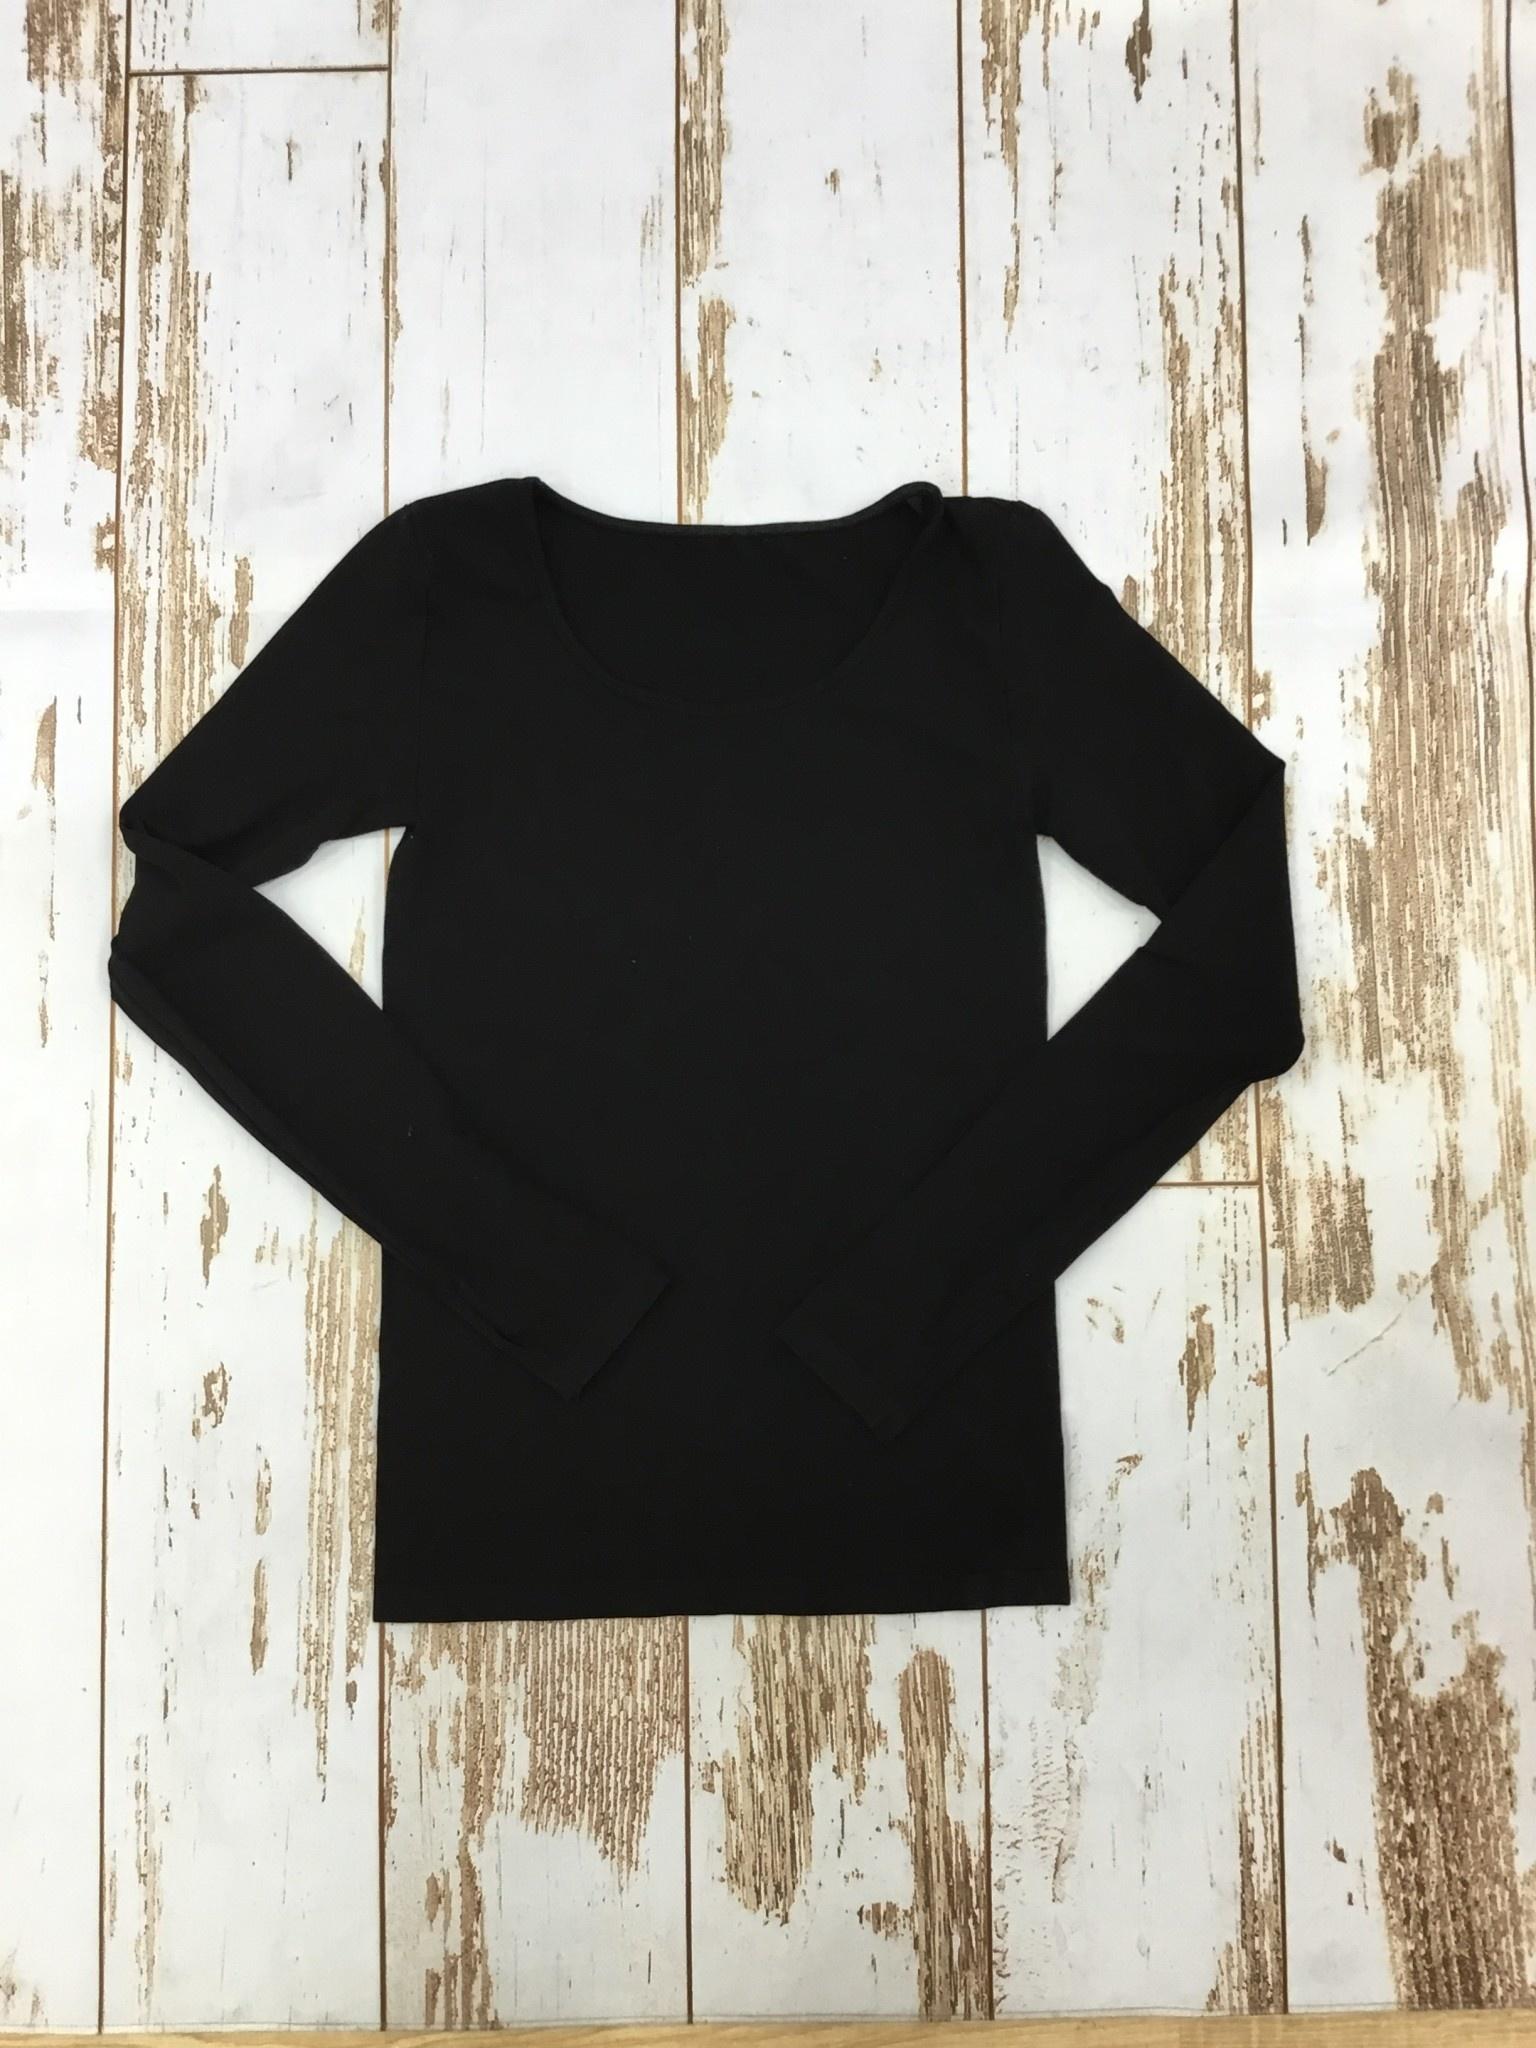 M.Rena Long Sleeve Top w/ Thumbhole in Black